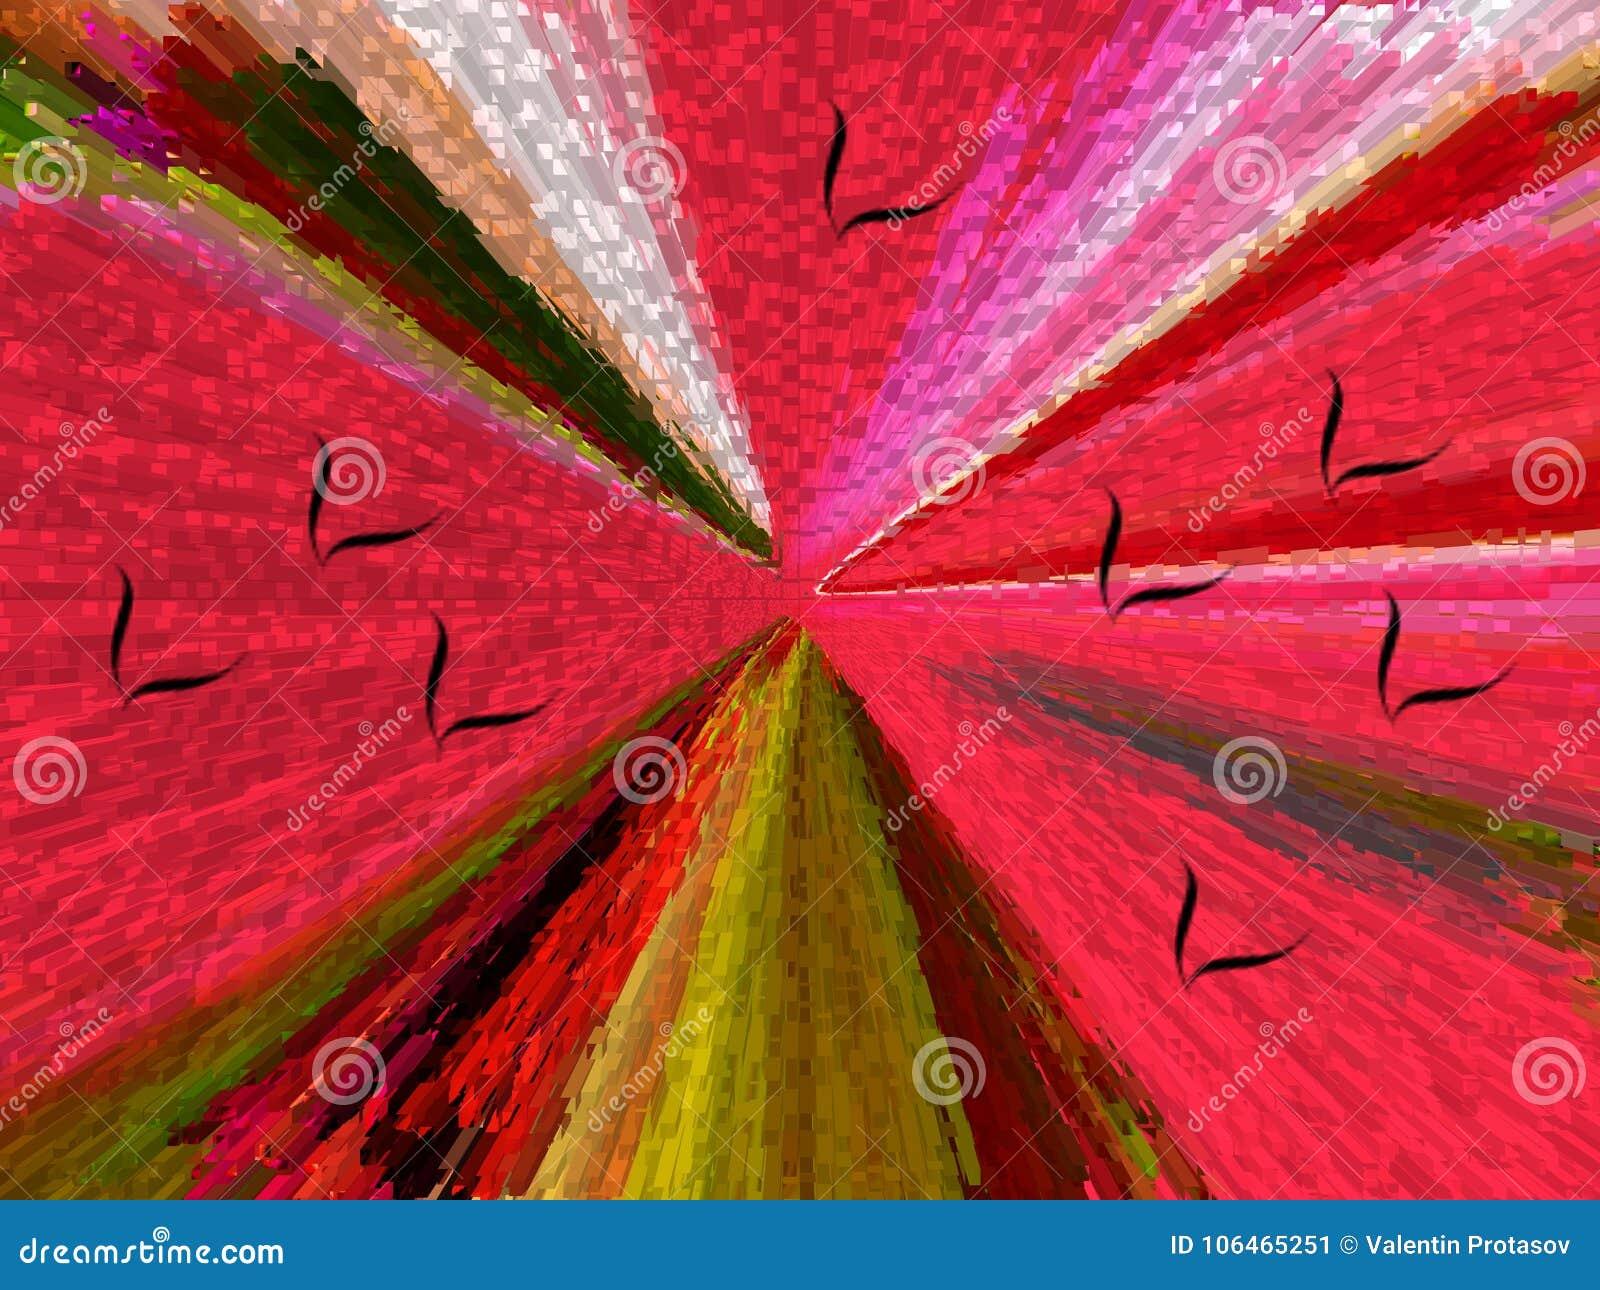 Abstrakcja Abstrakt obraz obrazek struktura _ jedyność abstrakcje abstrakty tekstury kolorowy kolory Grap